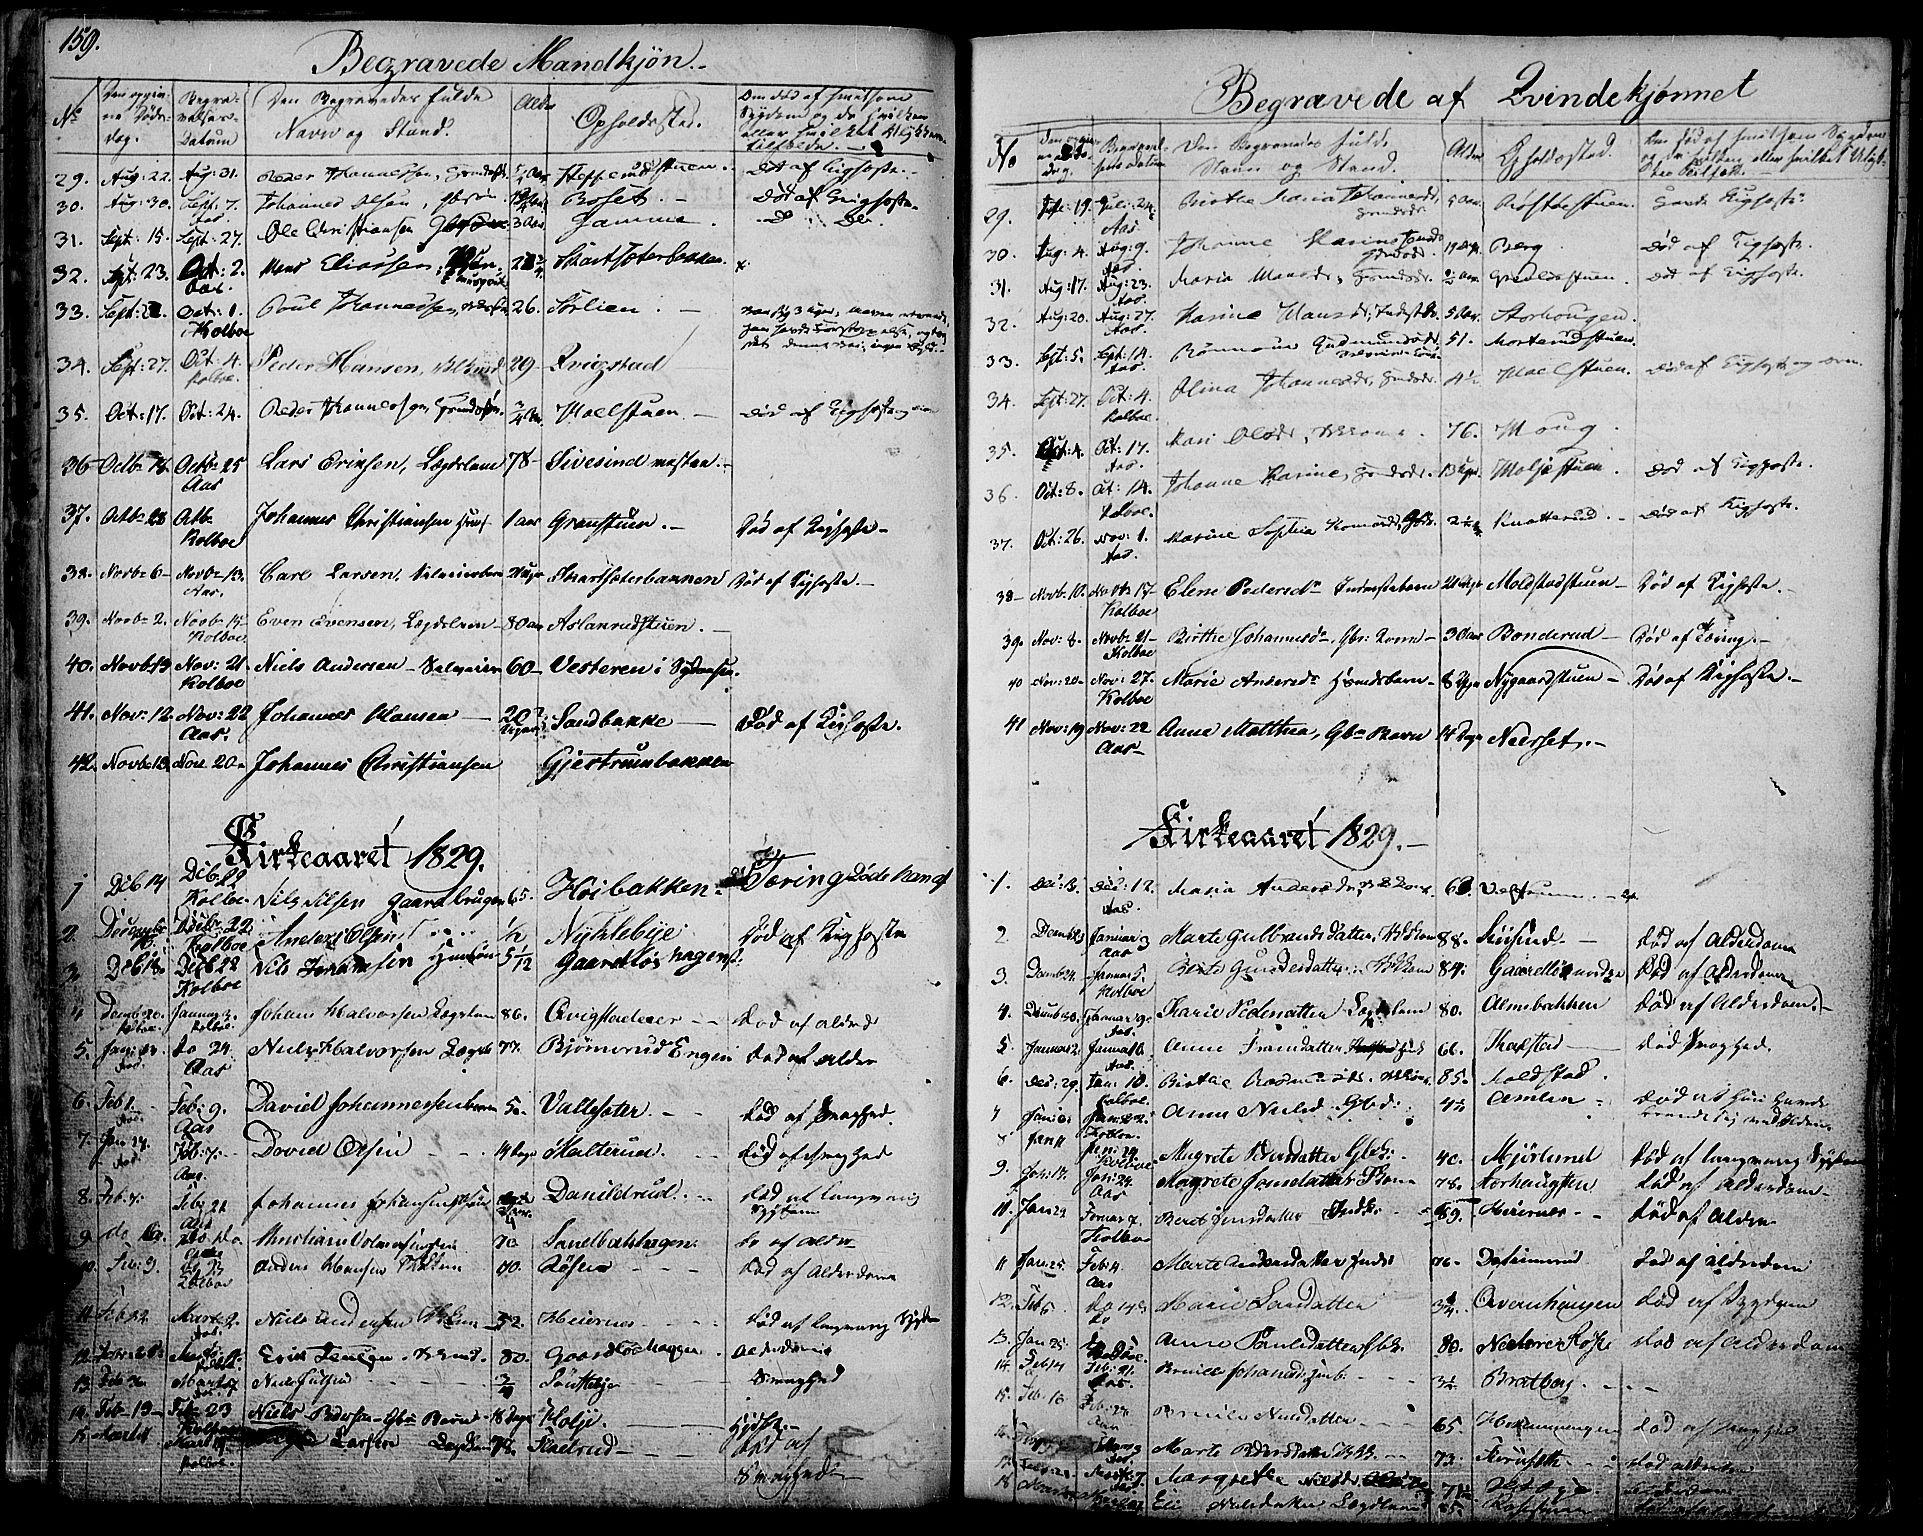 SAH, Vestre Toten prestekontor, H/Ha/Haa/L0002: Ministerialbok nr. 2, 1825-1837, s. 159